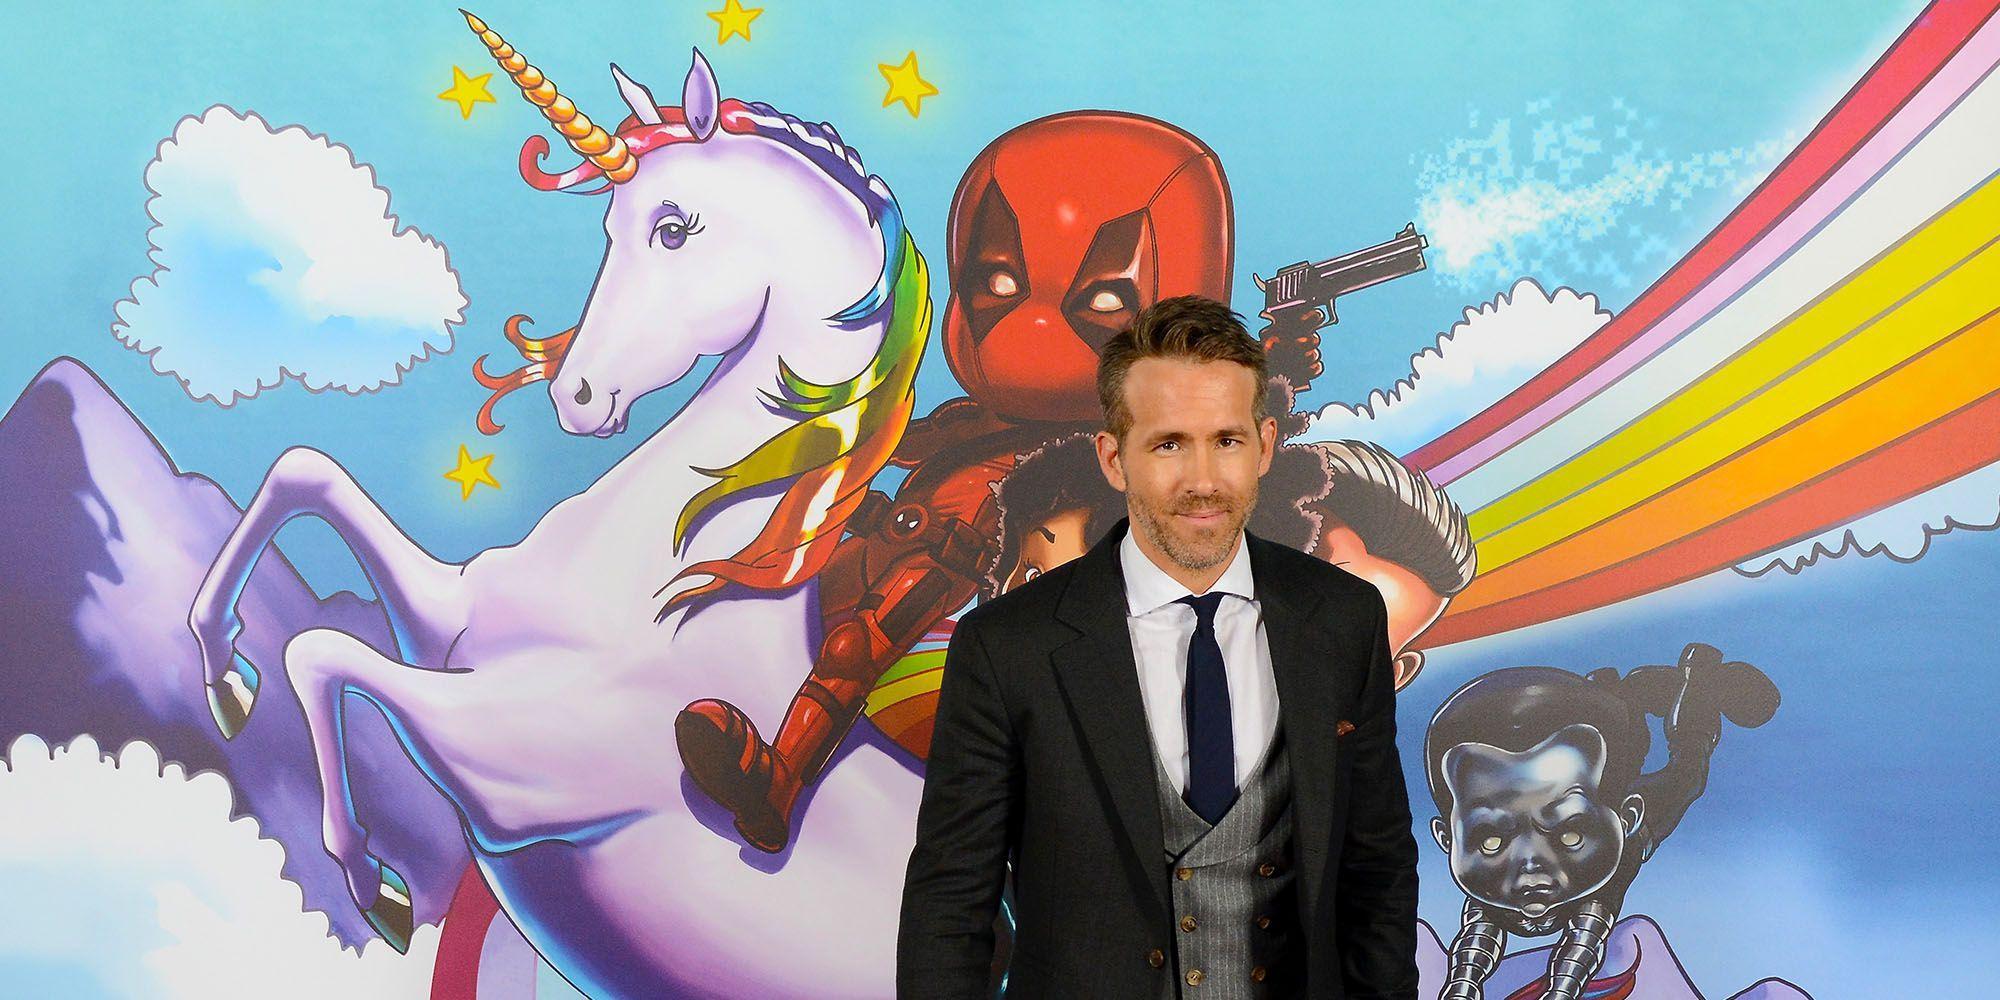 Ryan Reynolds Donne Son E Mail Pendant Une Interview